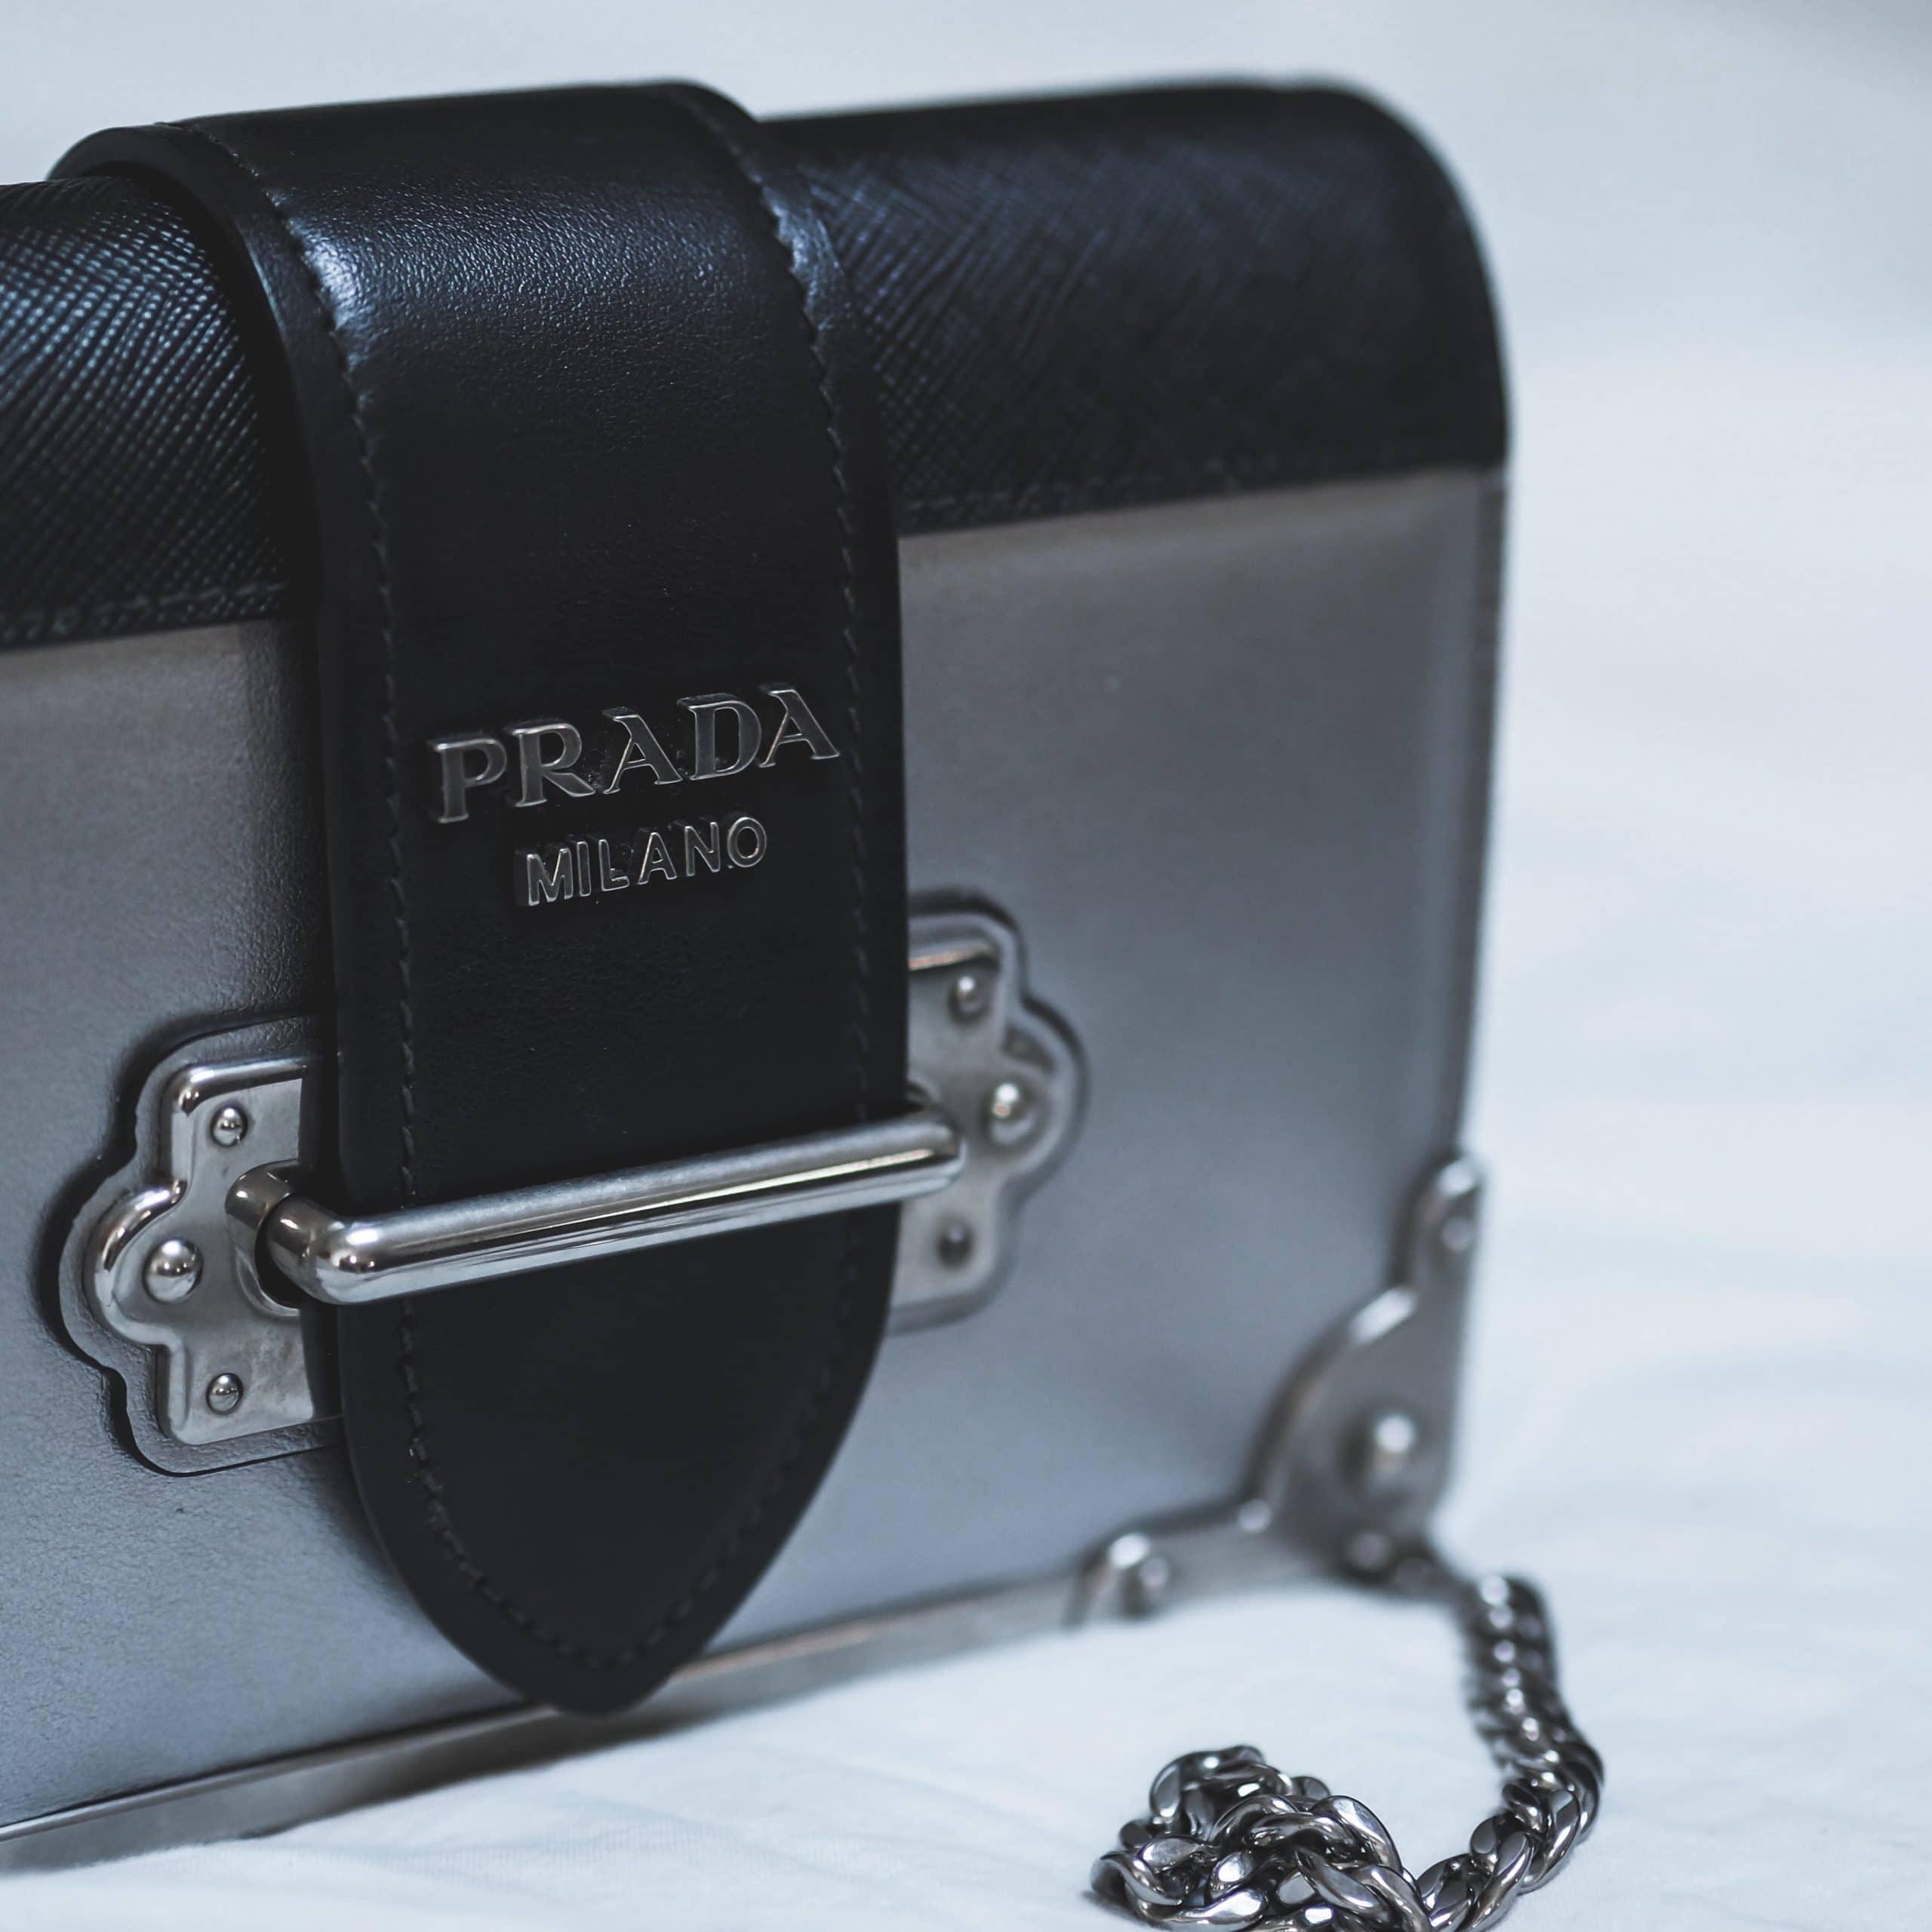 Prada branding